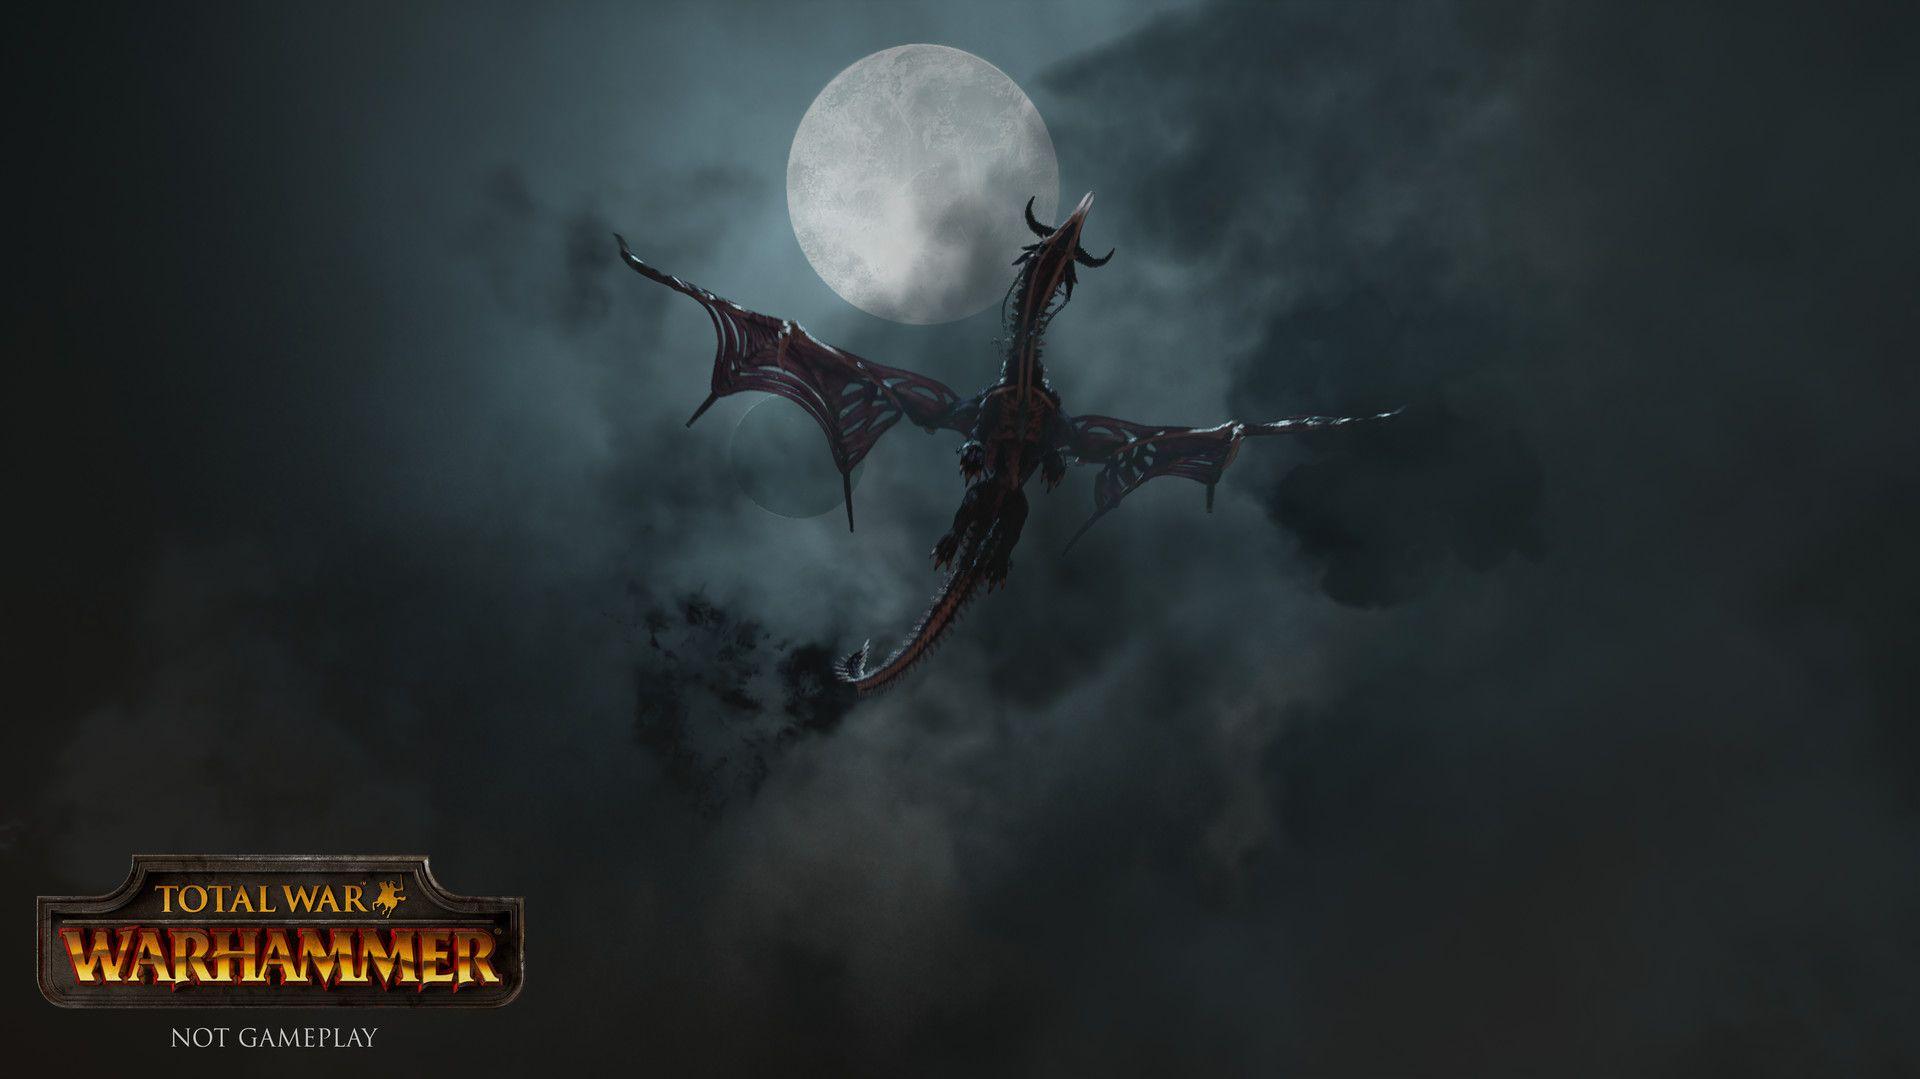 Total War: Warhammer (PC) - 8